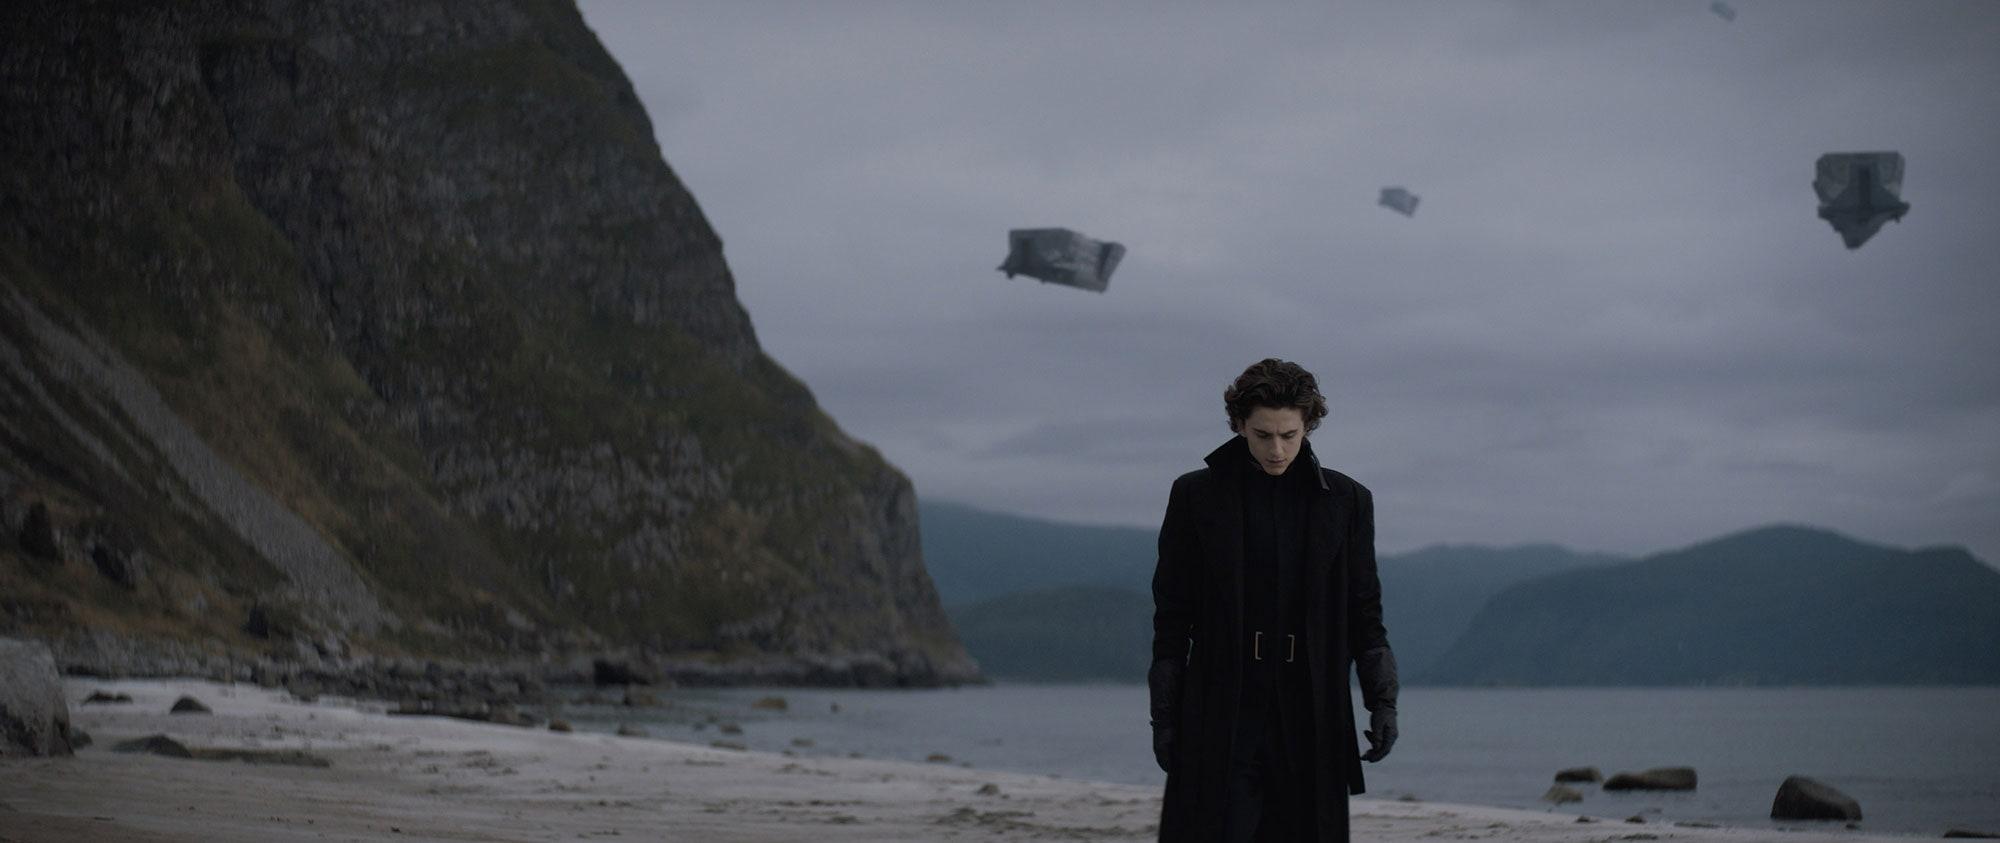 Más imágenes promocionales de Dune de Denis Villeneuve y Legendary Pictures